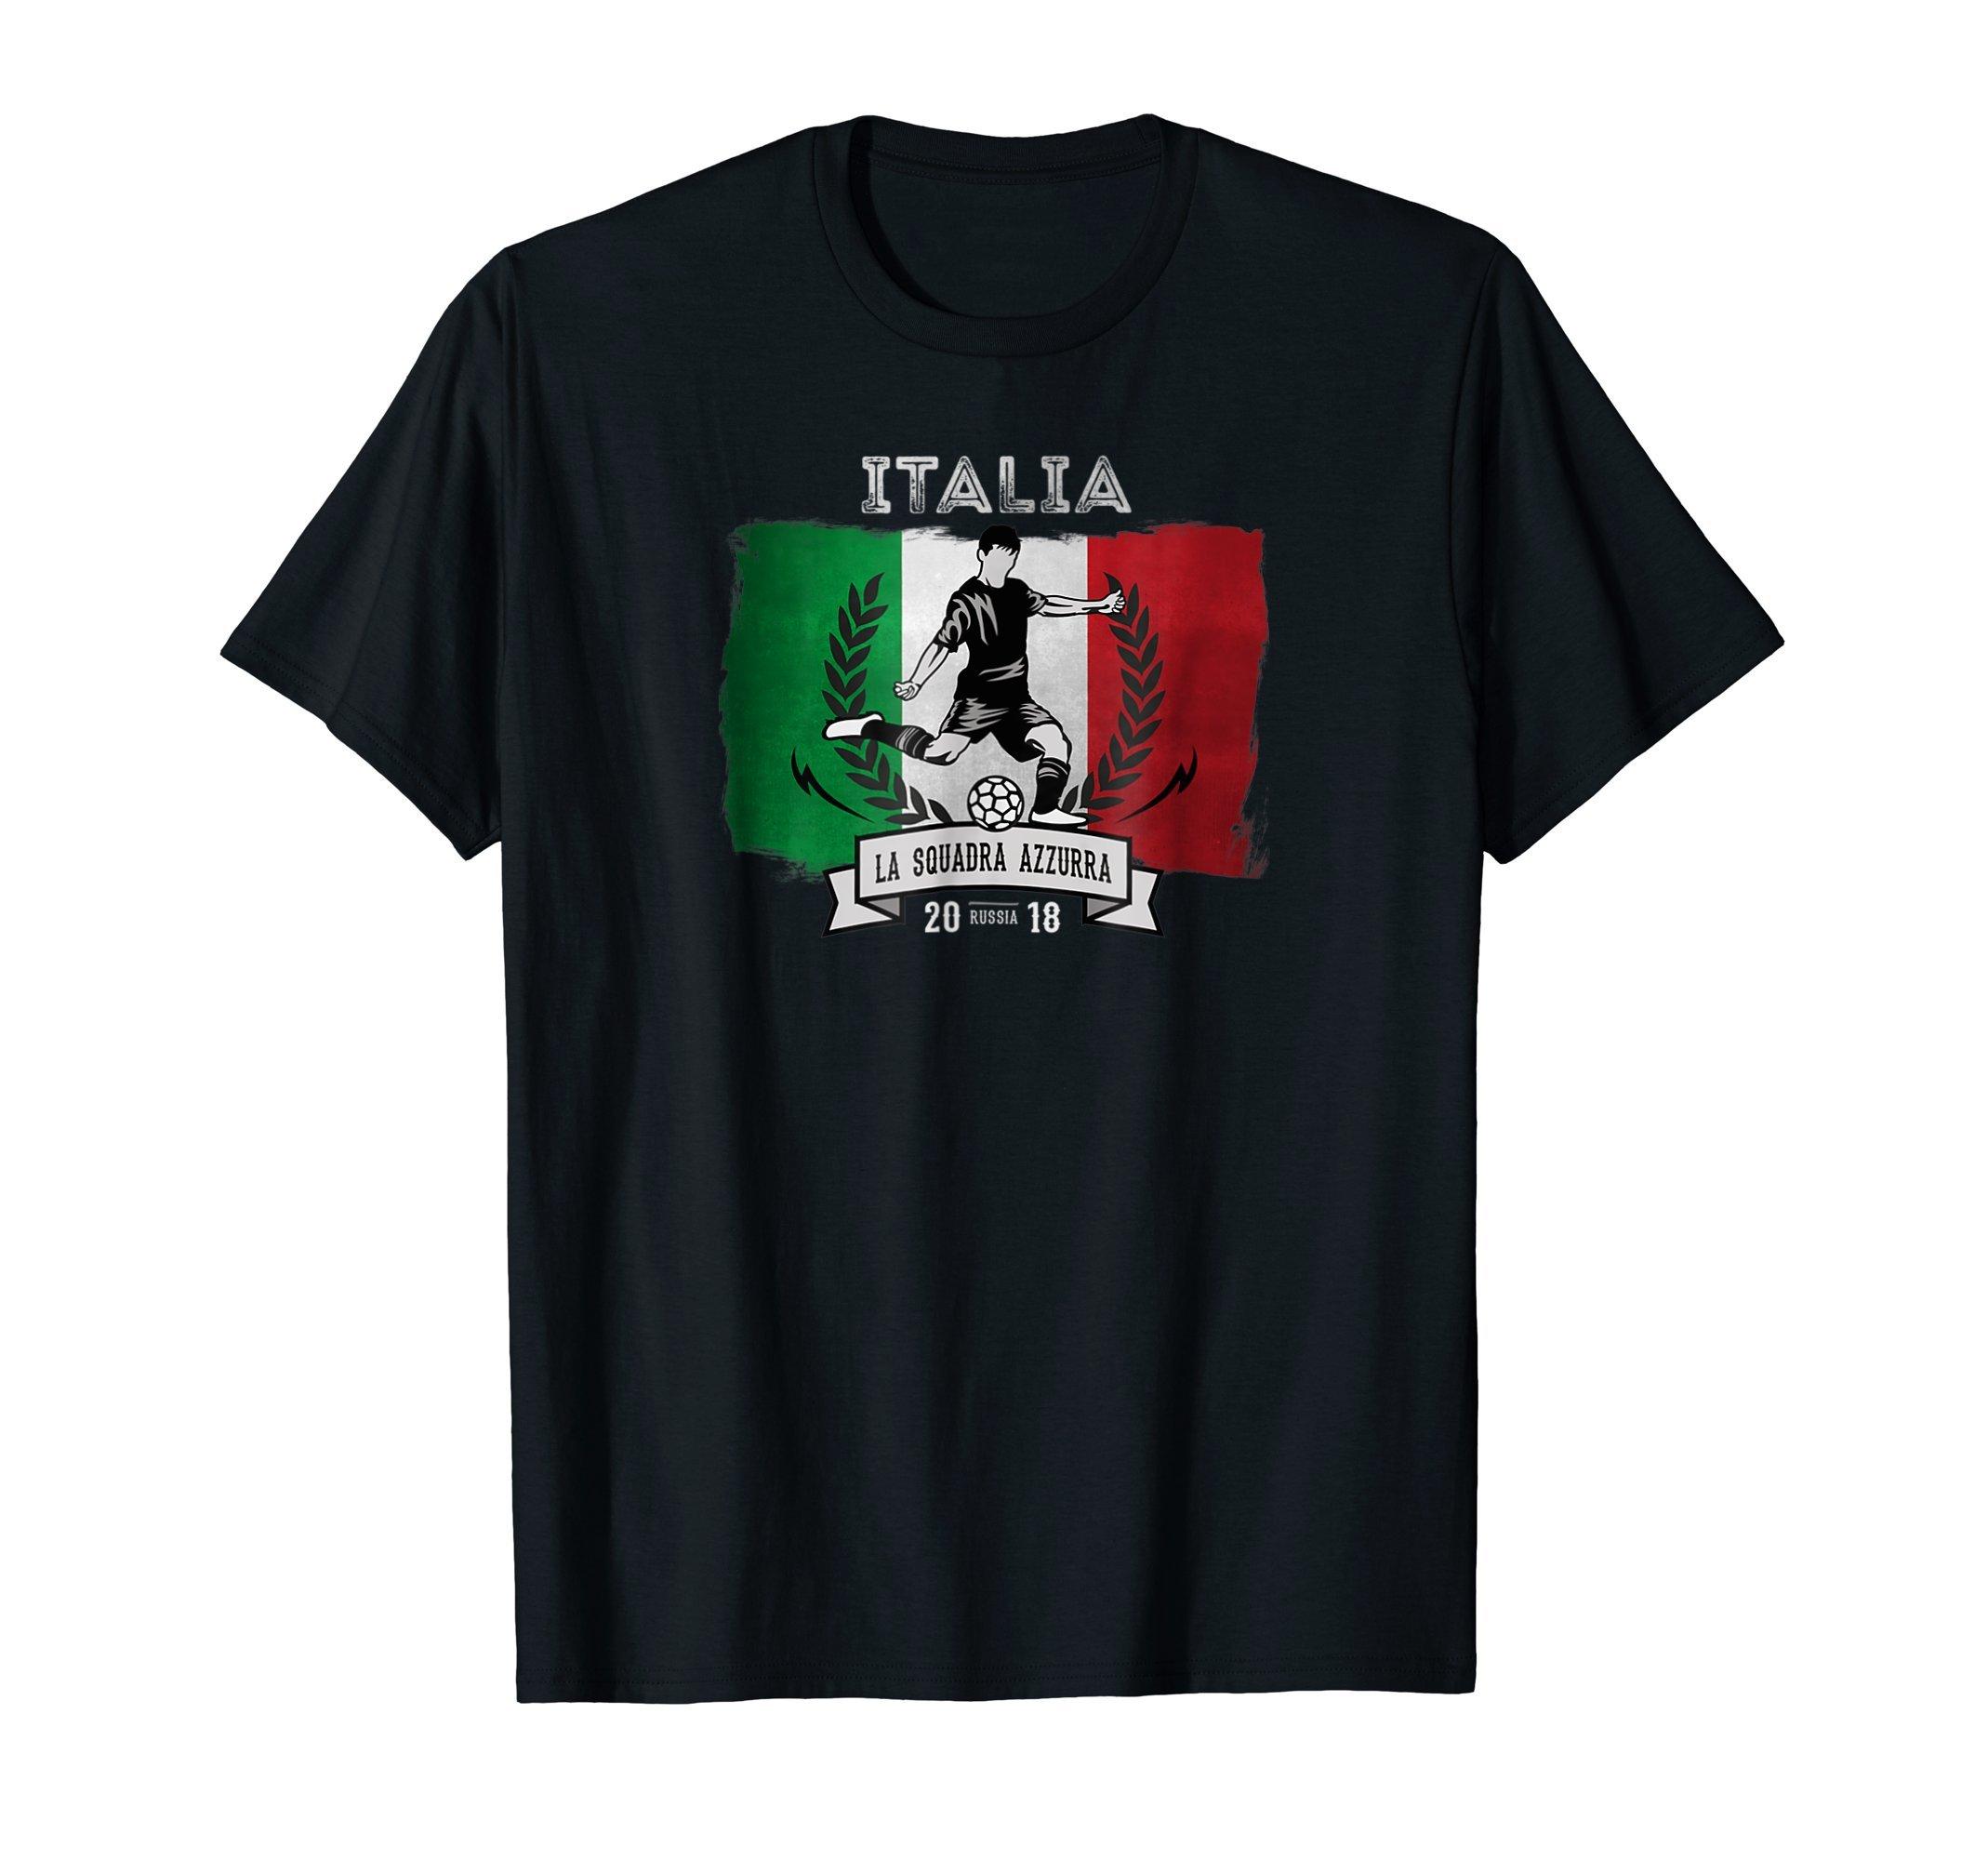 Italy Soccer Team Russia 2018 Italian Football Fan TShirt